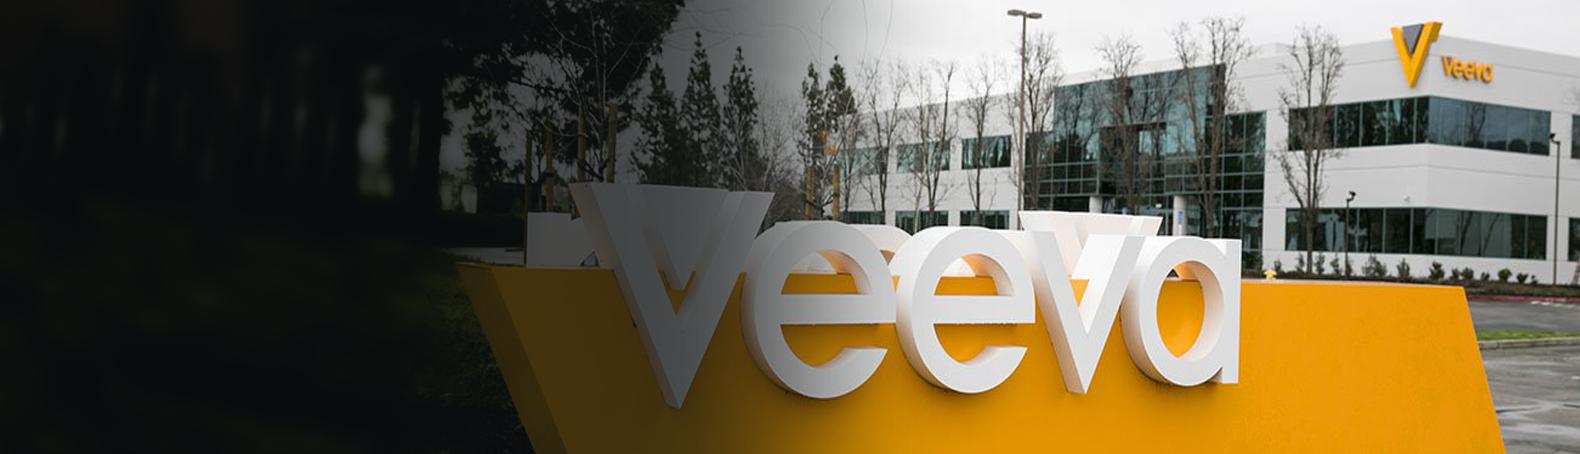 Veeva_About slide